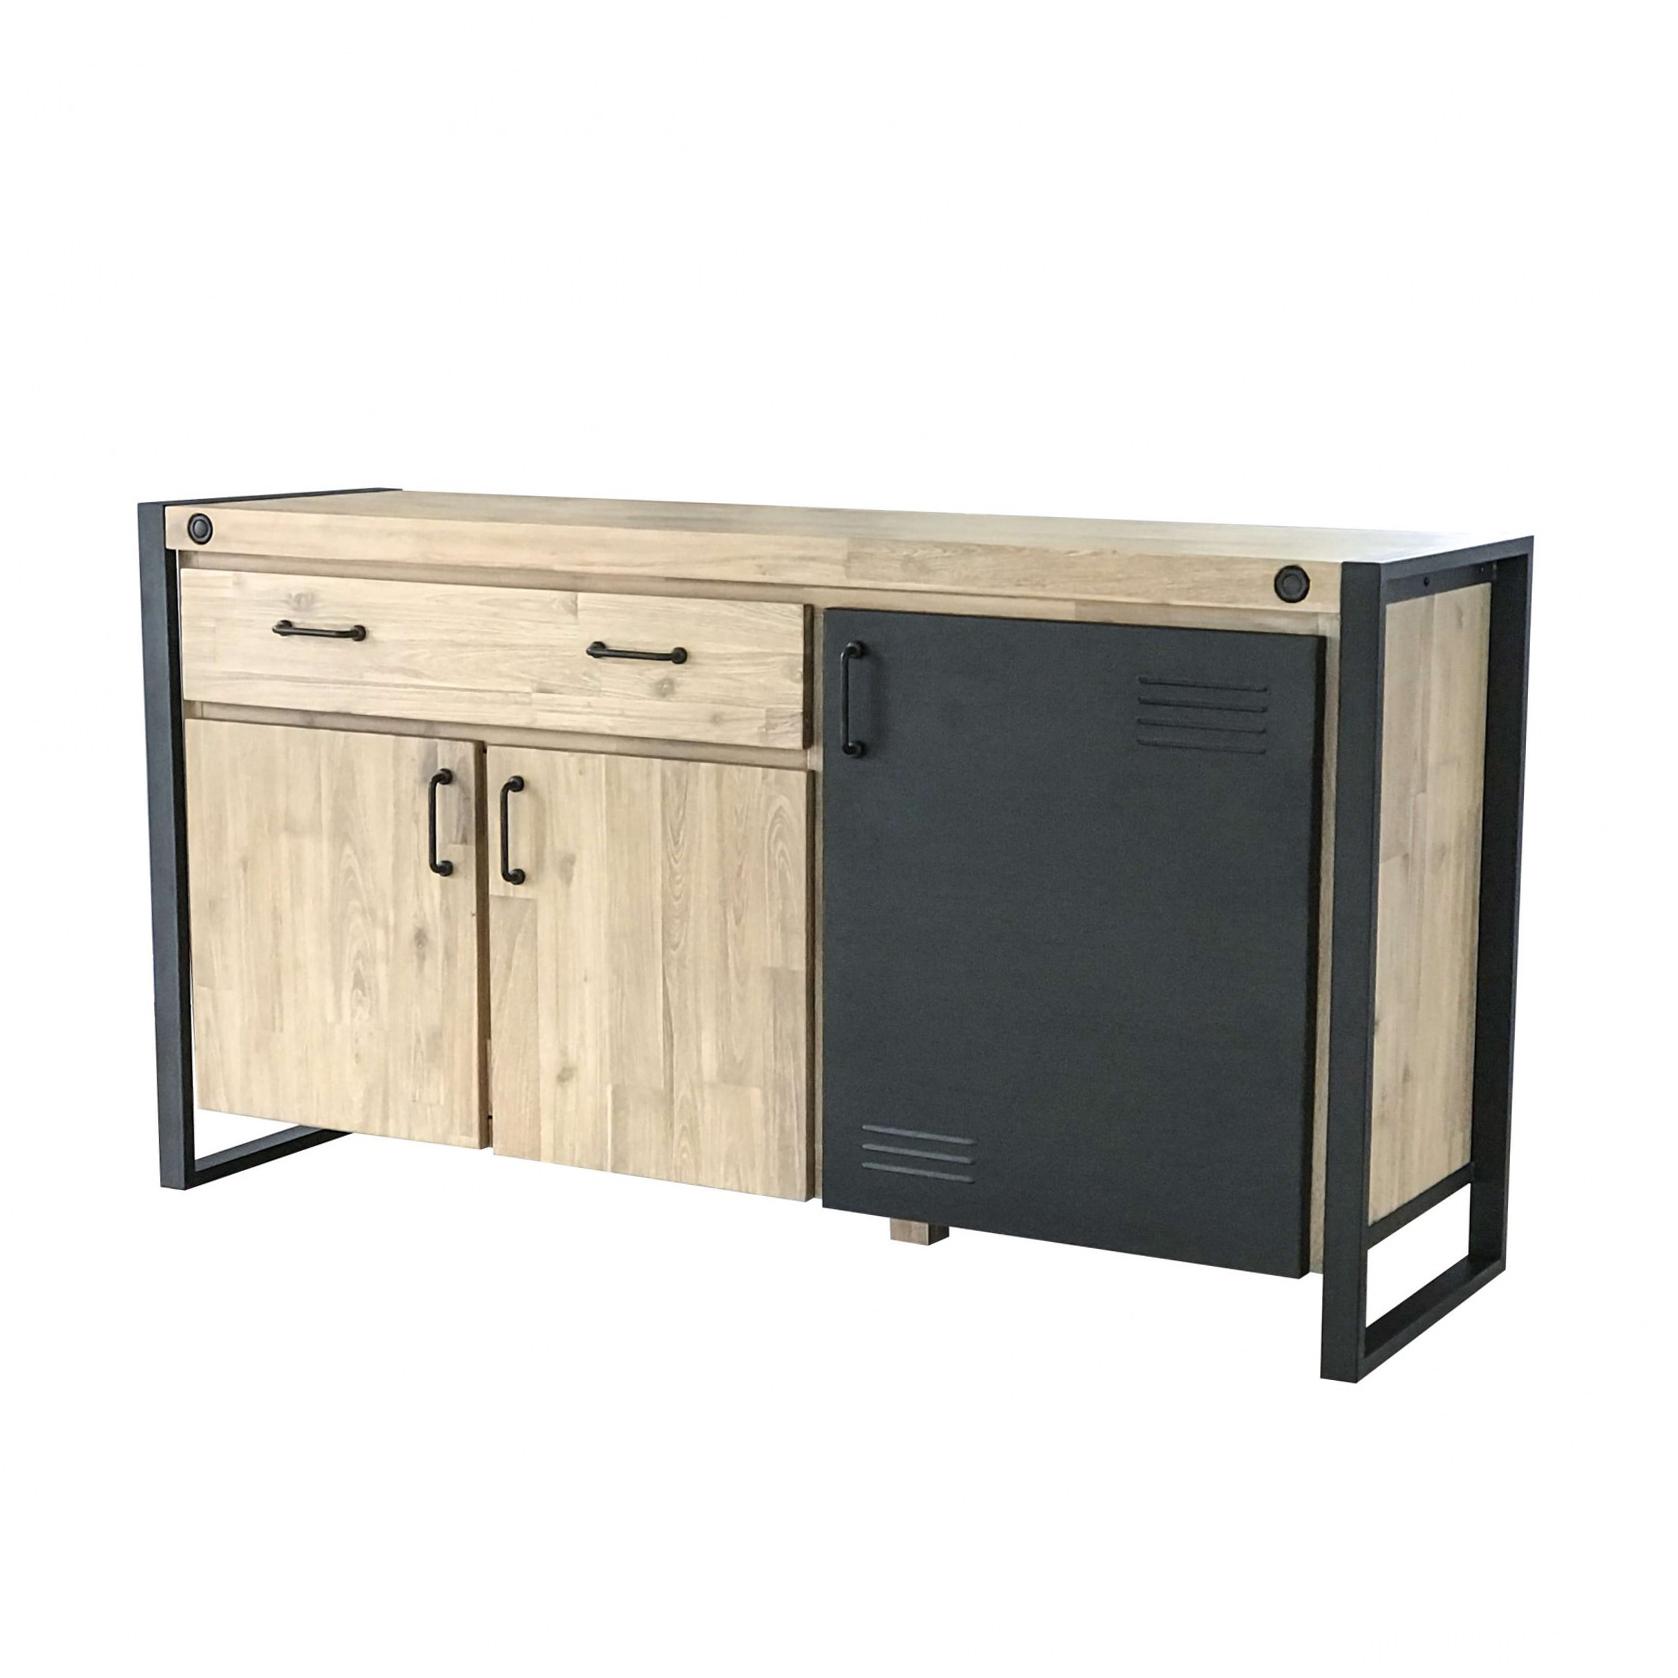 Aparador Boston, madeira de acácia/metal, 150x75